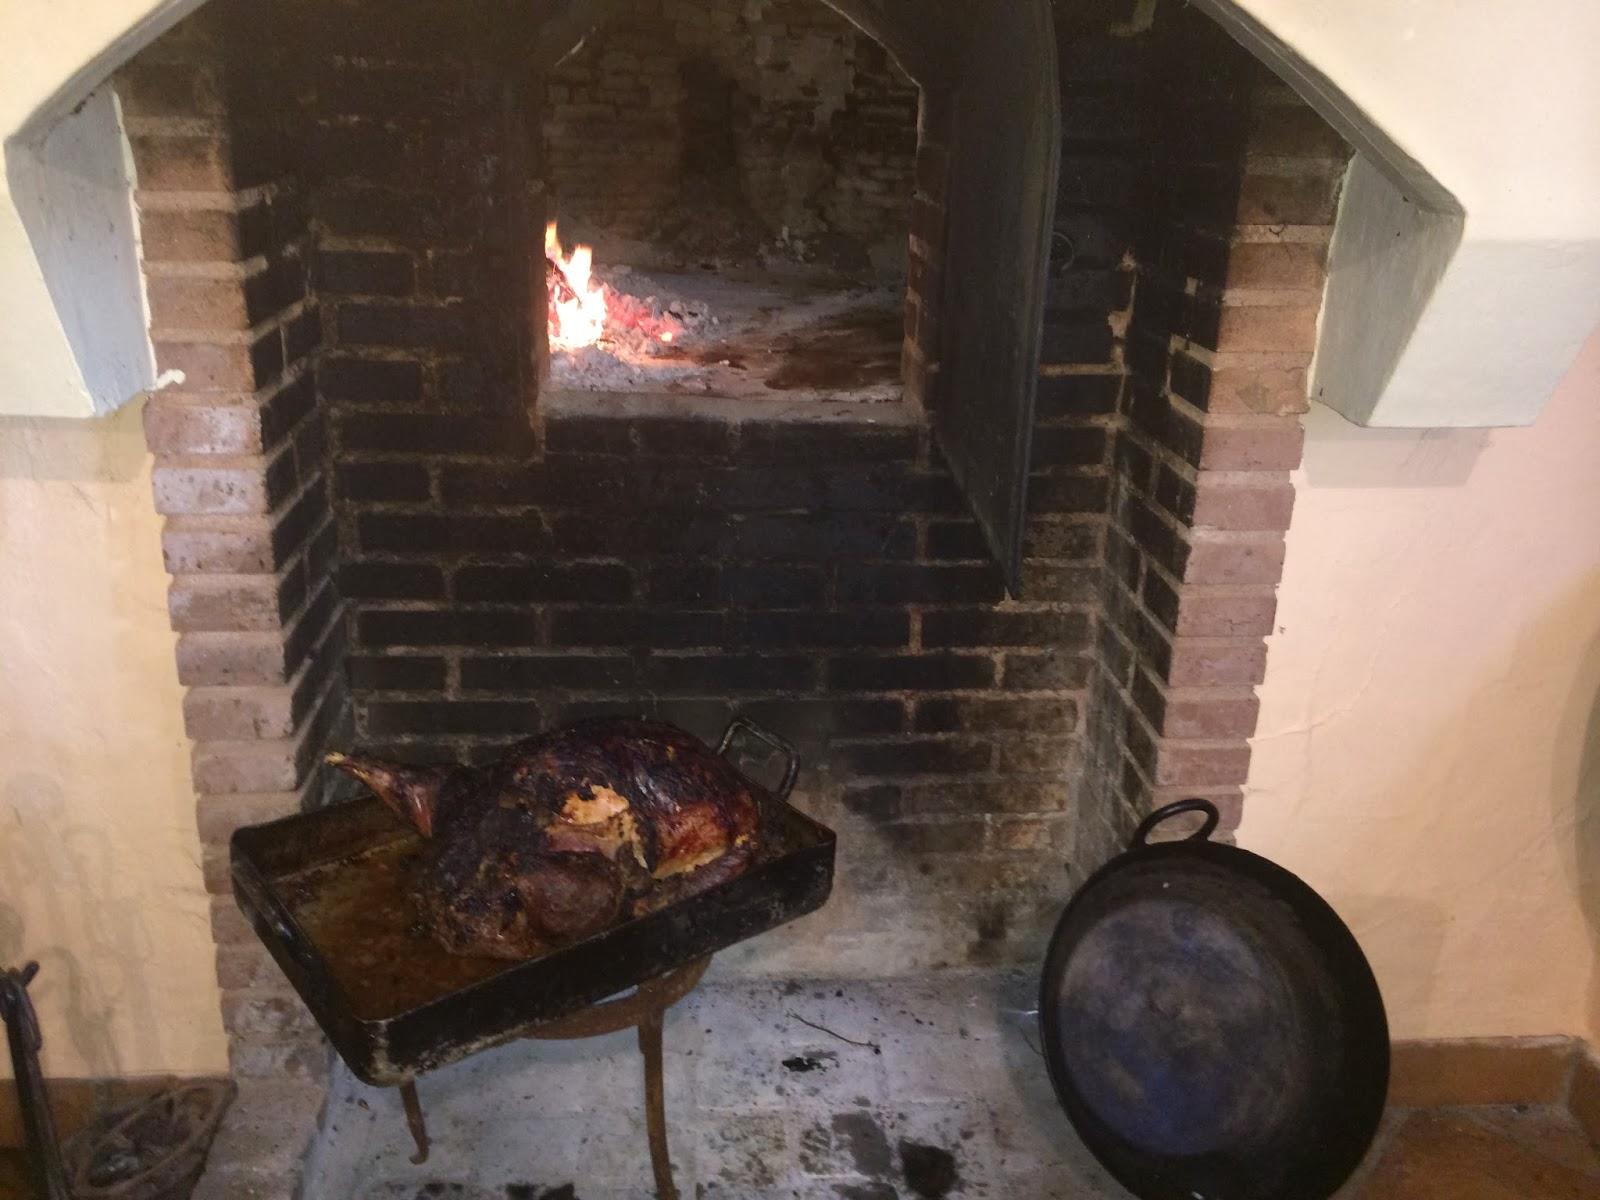 Pavo relleno al horno de Leña